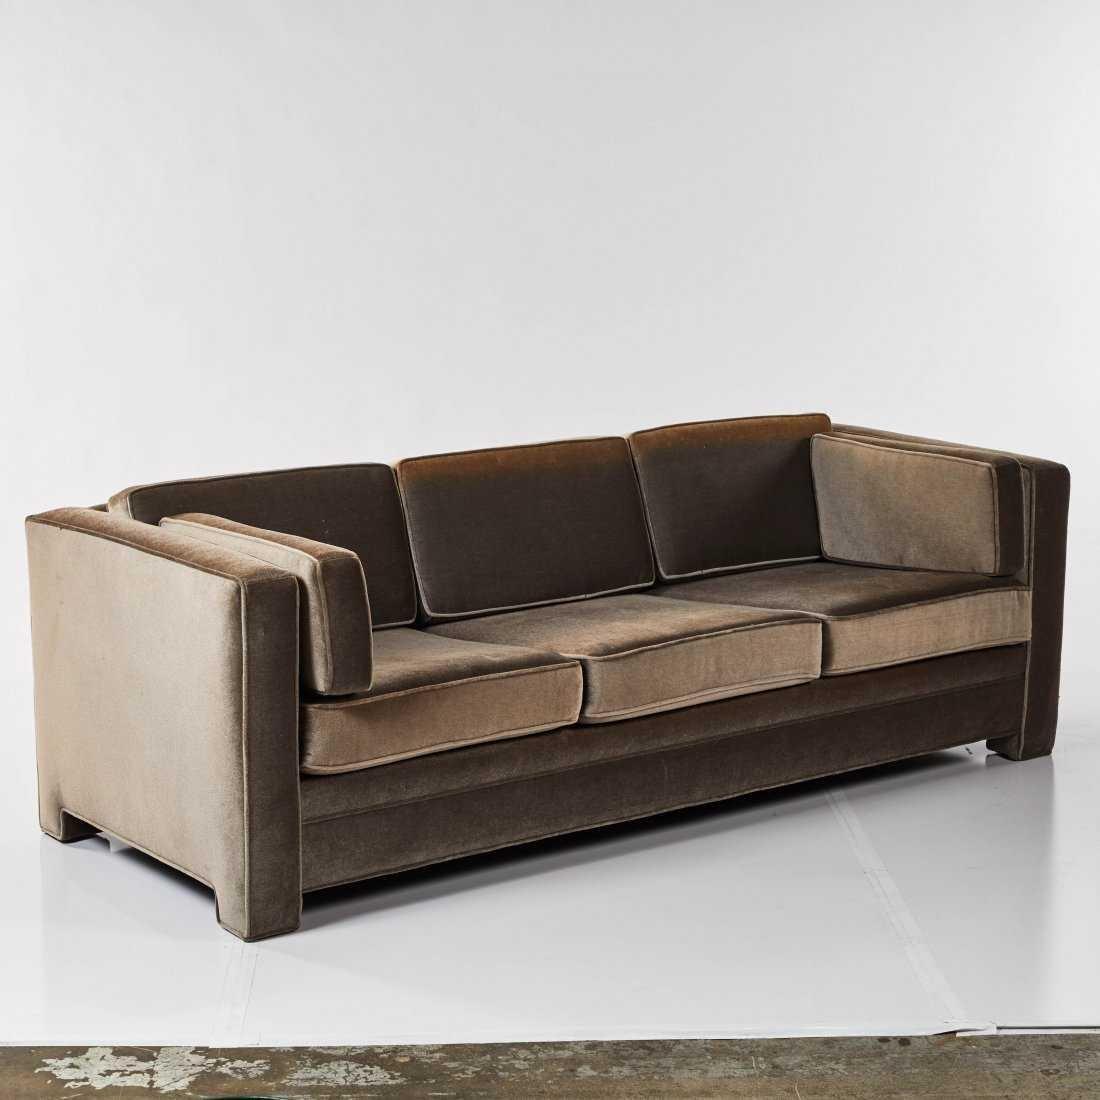 Modernist Mohair Sofa - 2